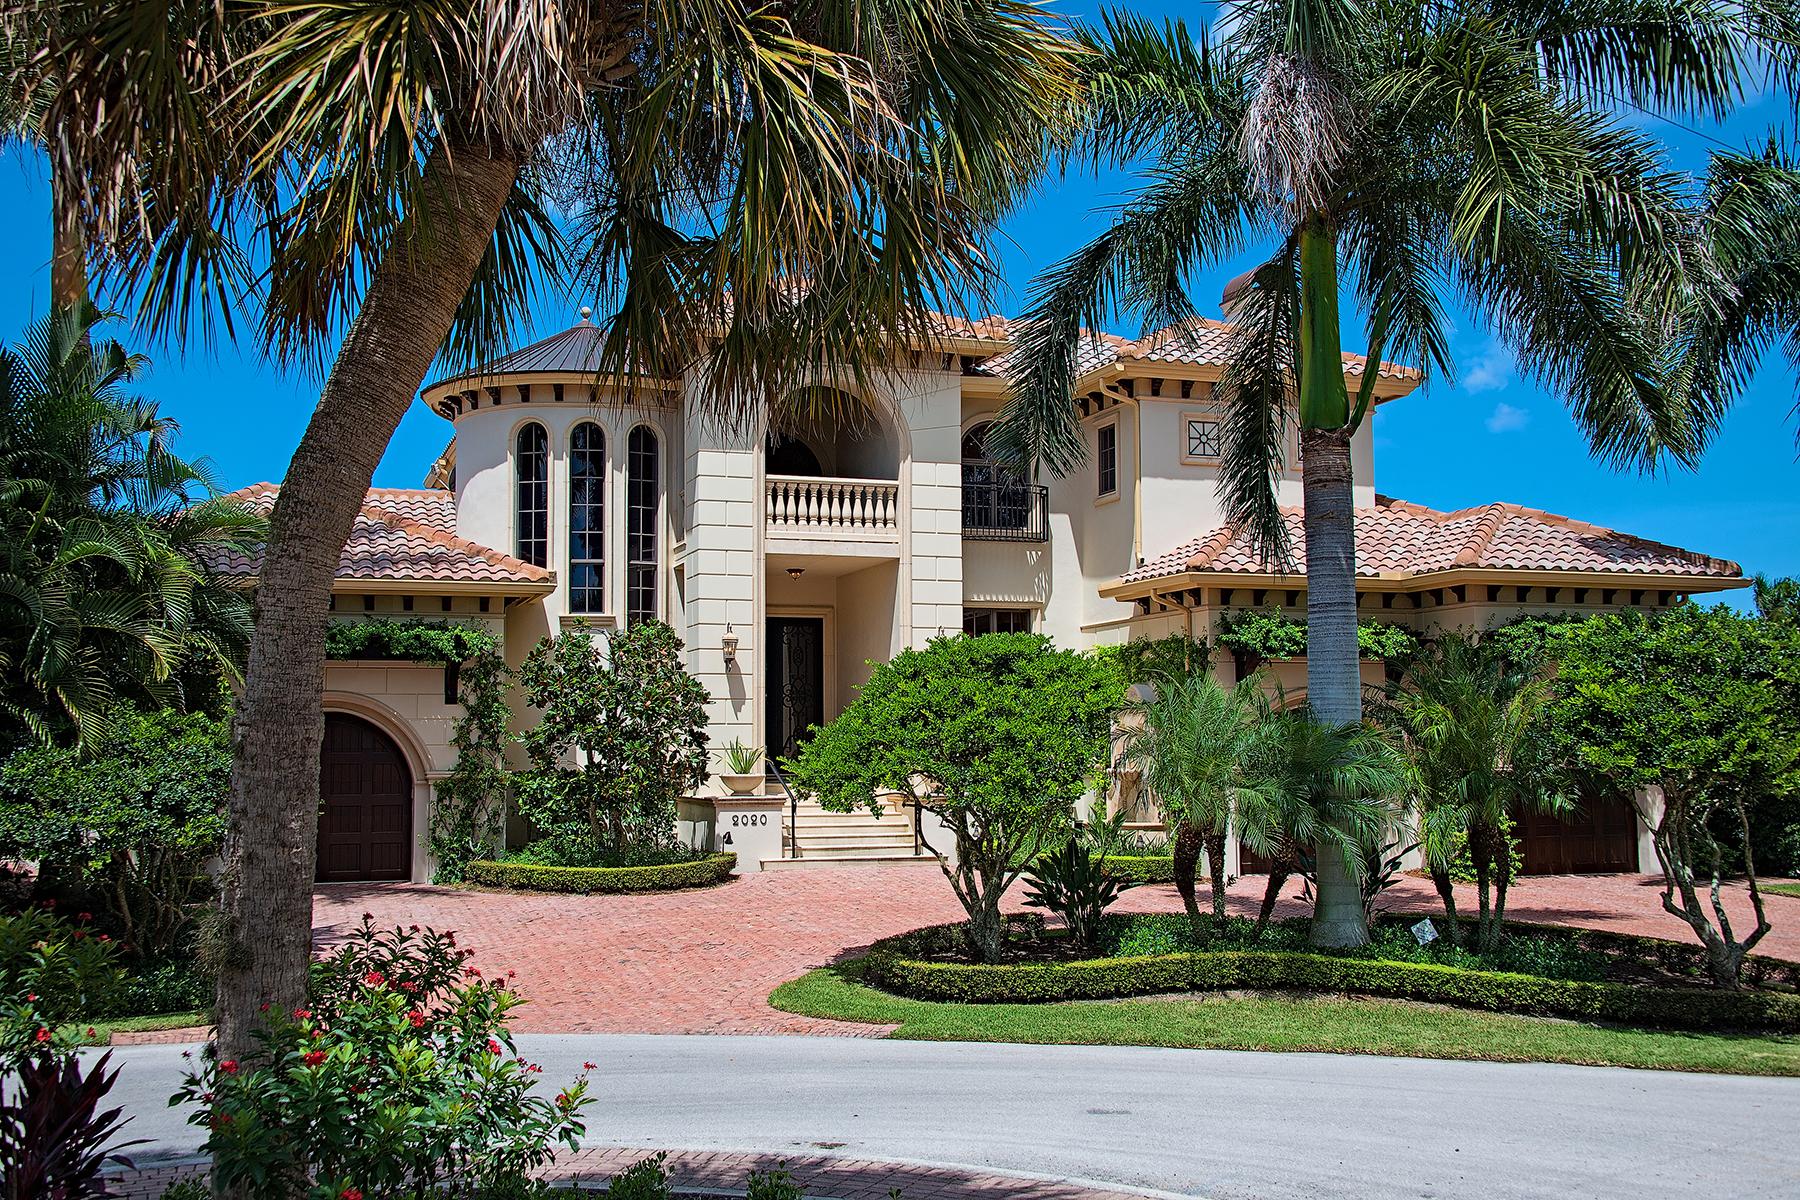 واحد منزل الأسرة للـ Sale في PORT ROYAL - AQUALANE SHORES 2020 6th St S Naples, Florida 34102 United States